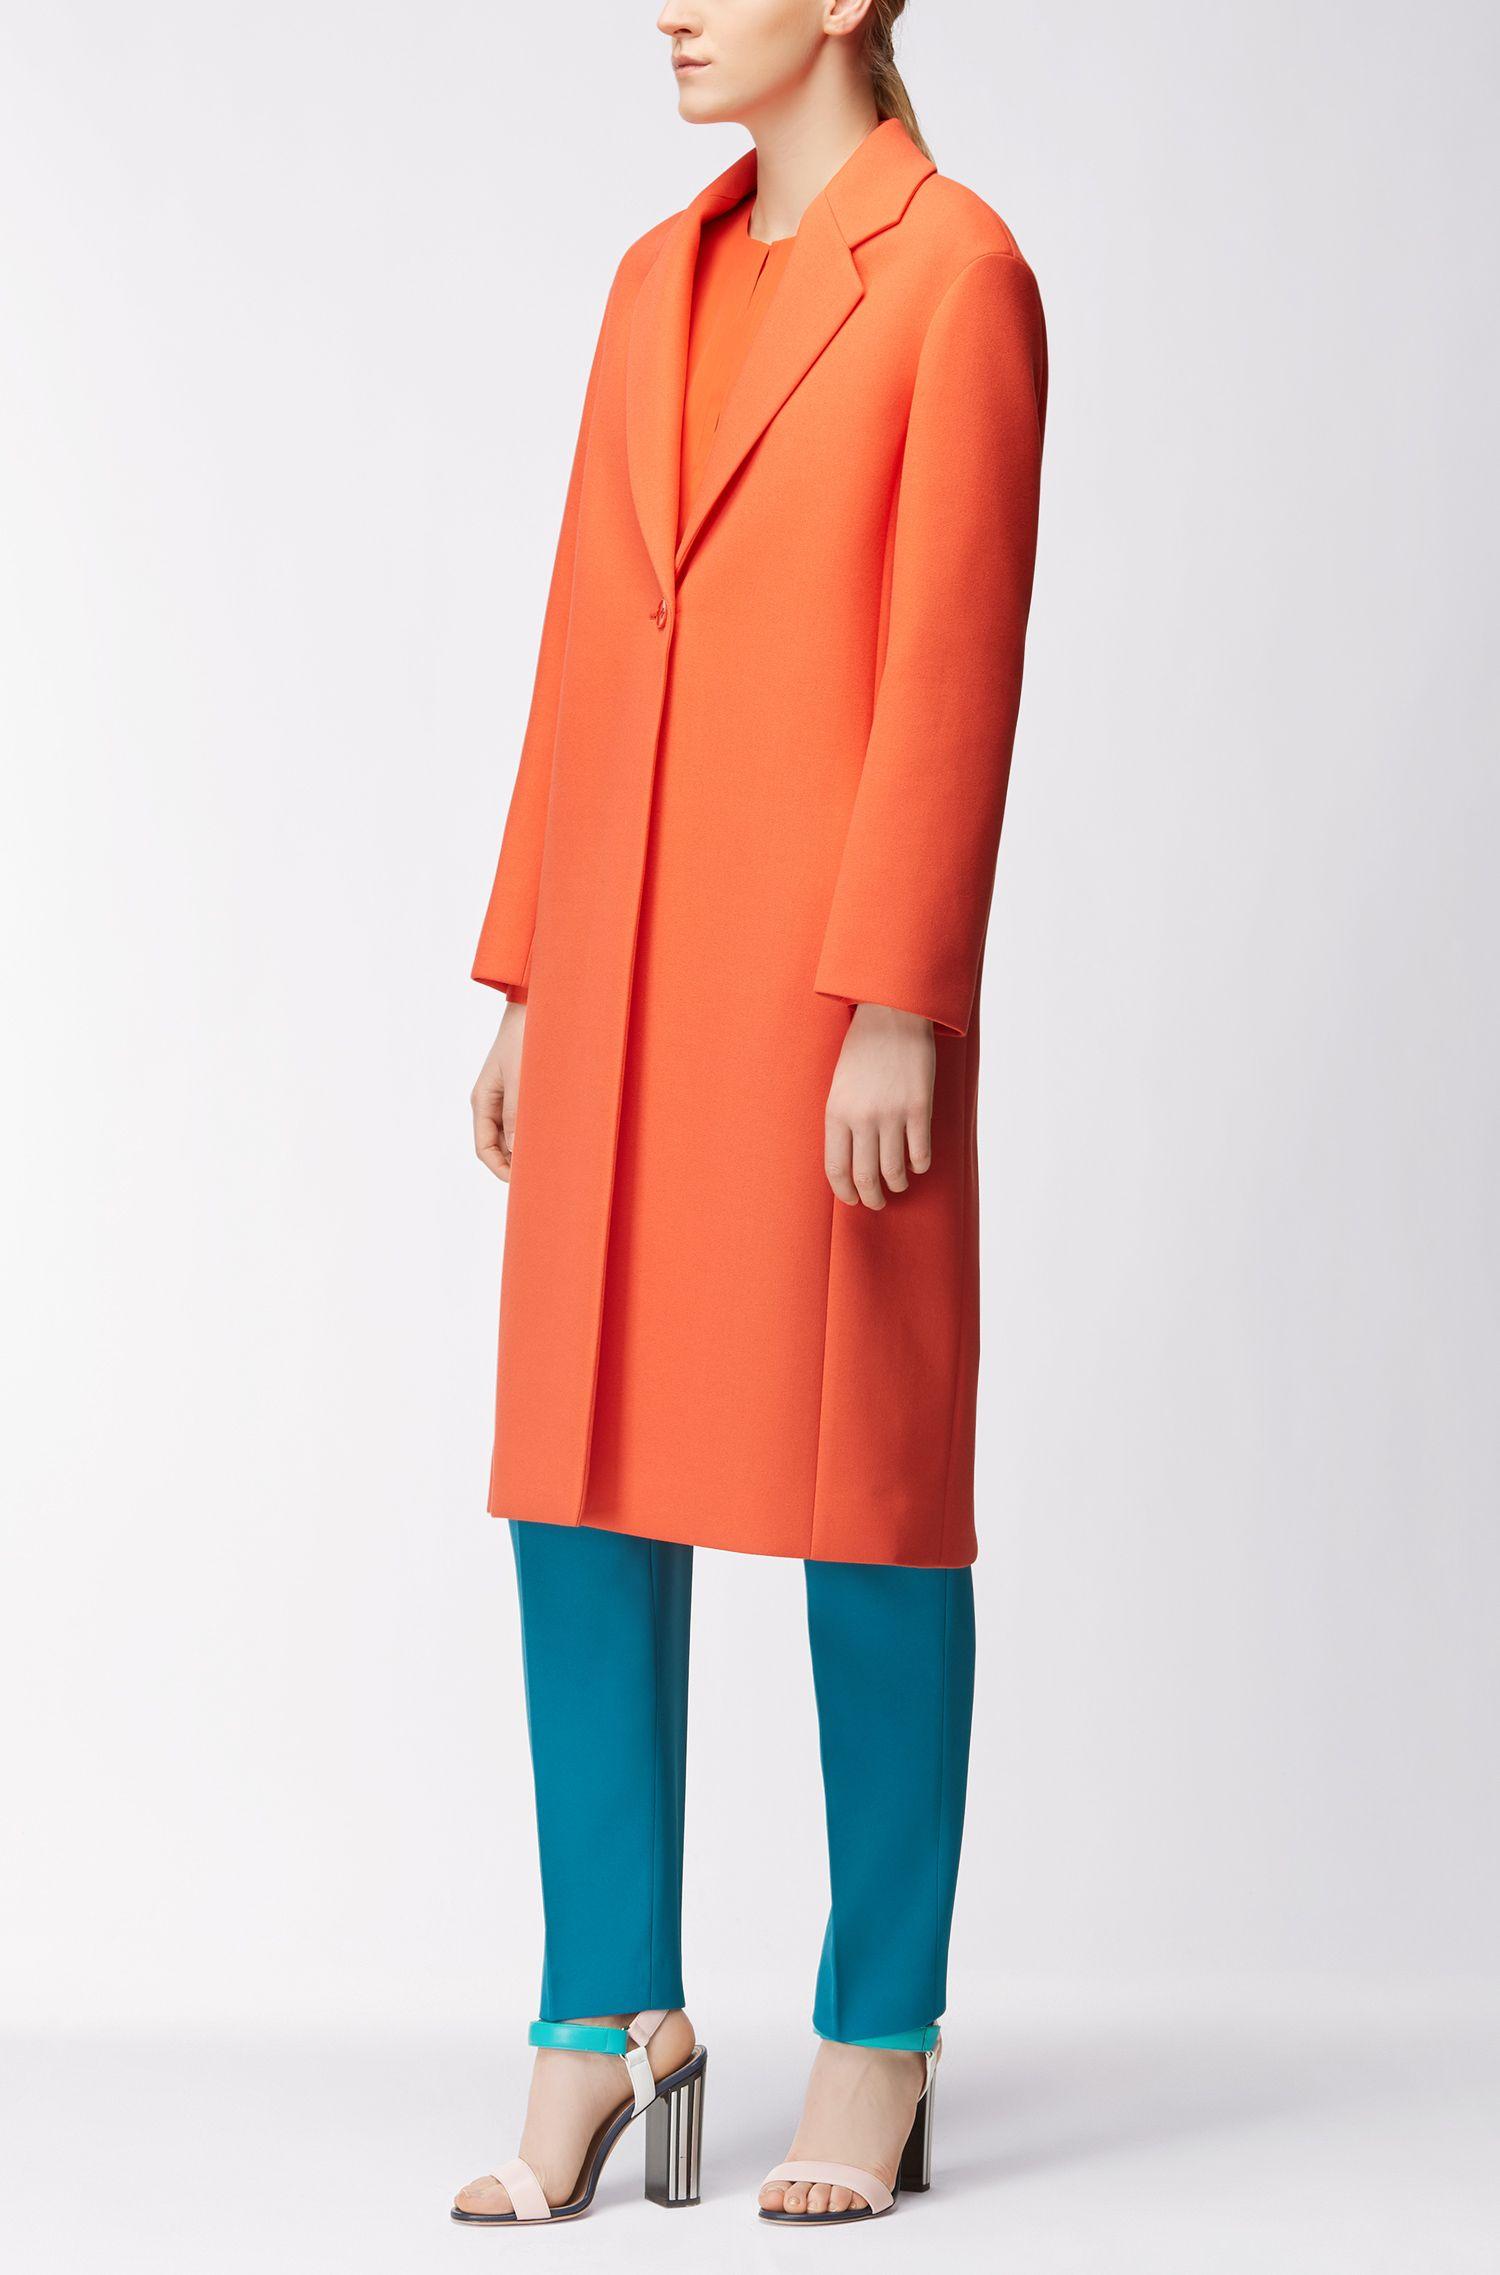 Hugo Boss Single-Button Coat Calenara GC 8 Orange BOSS